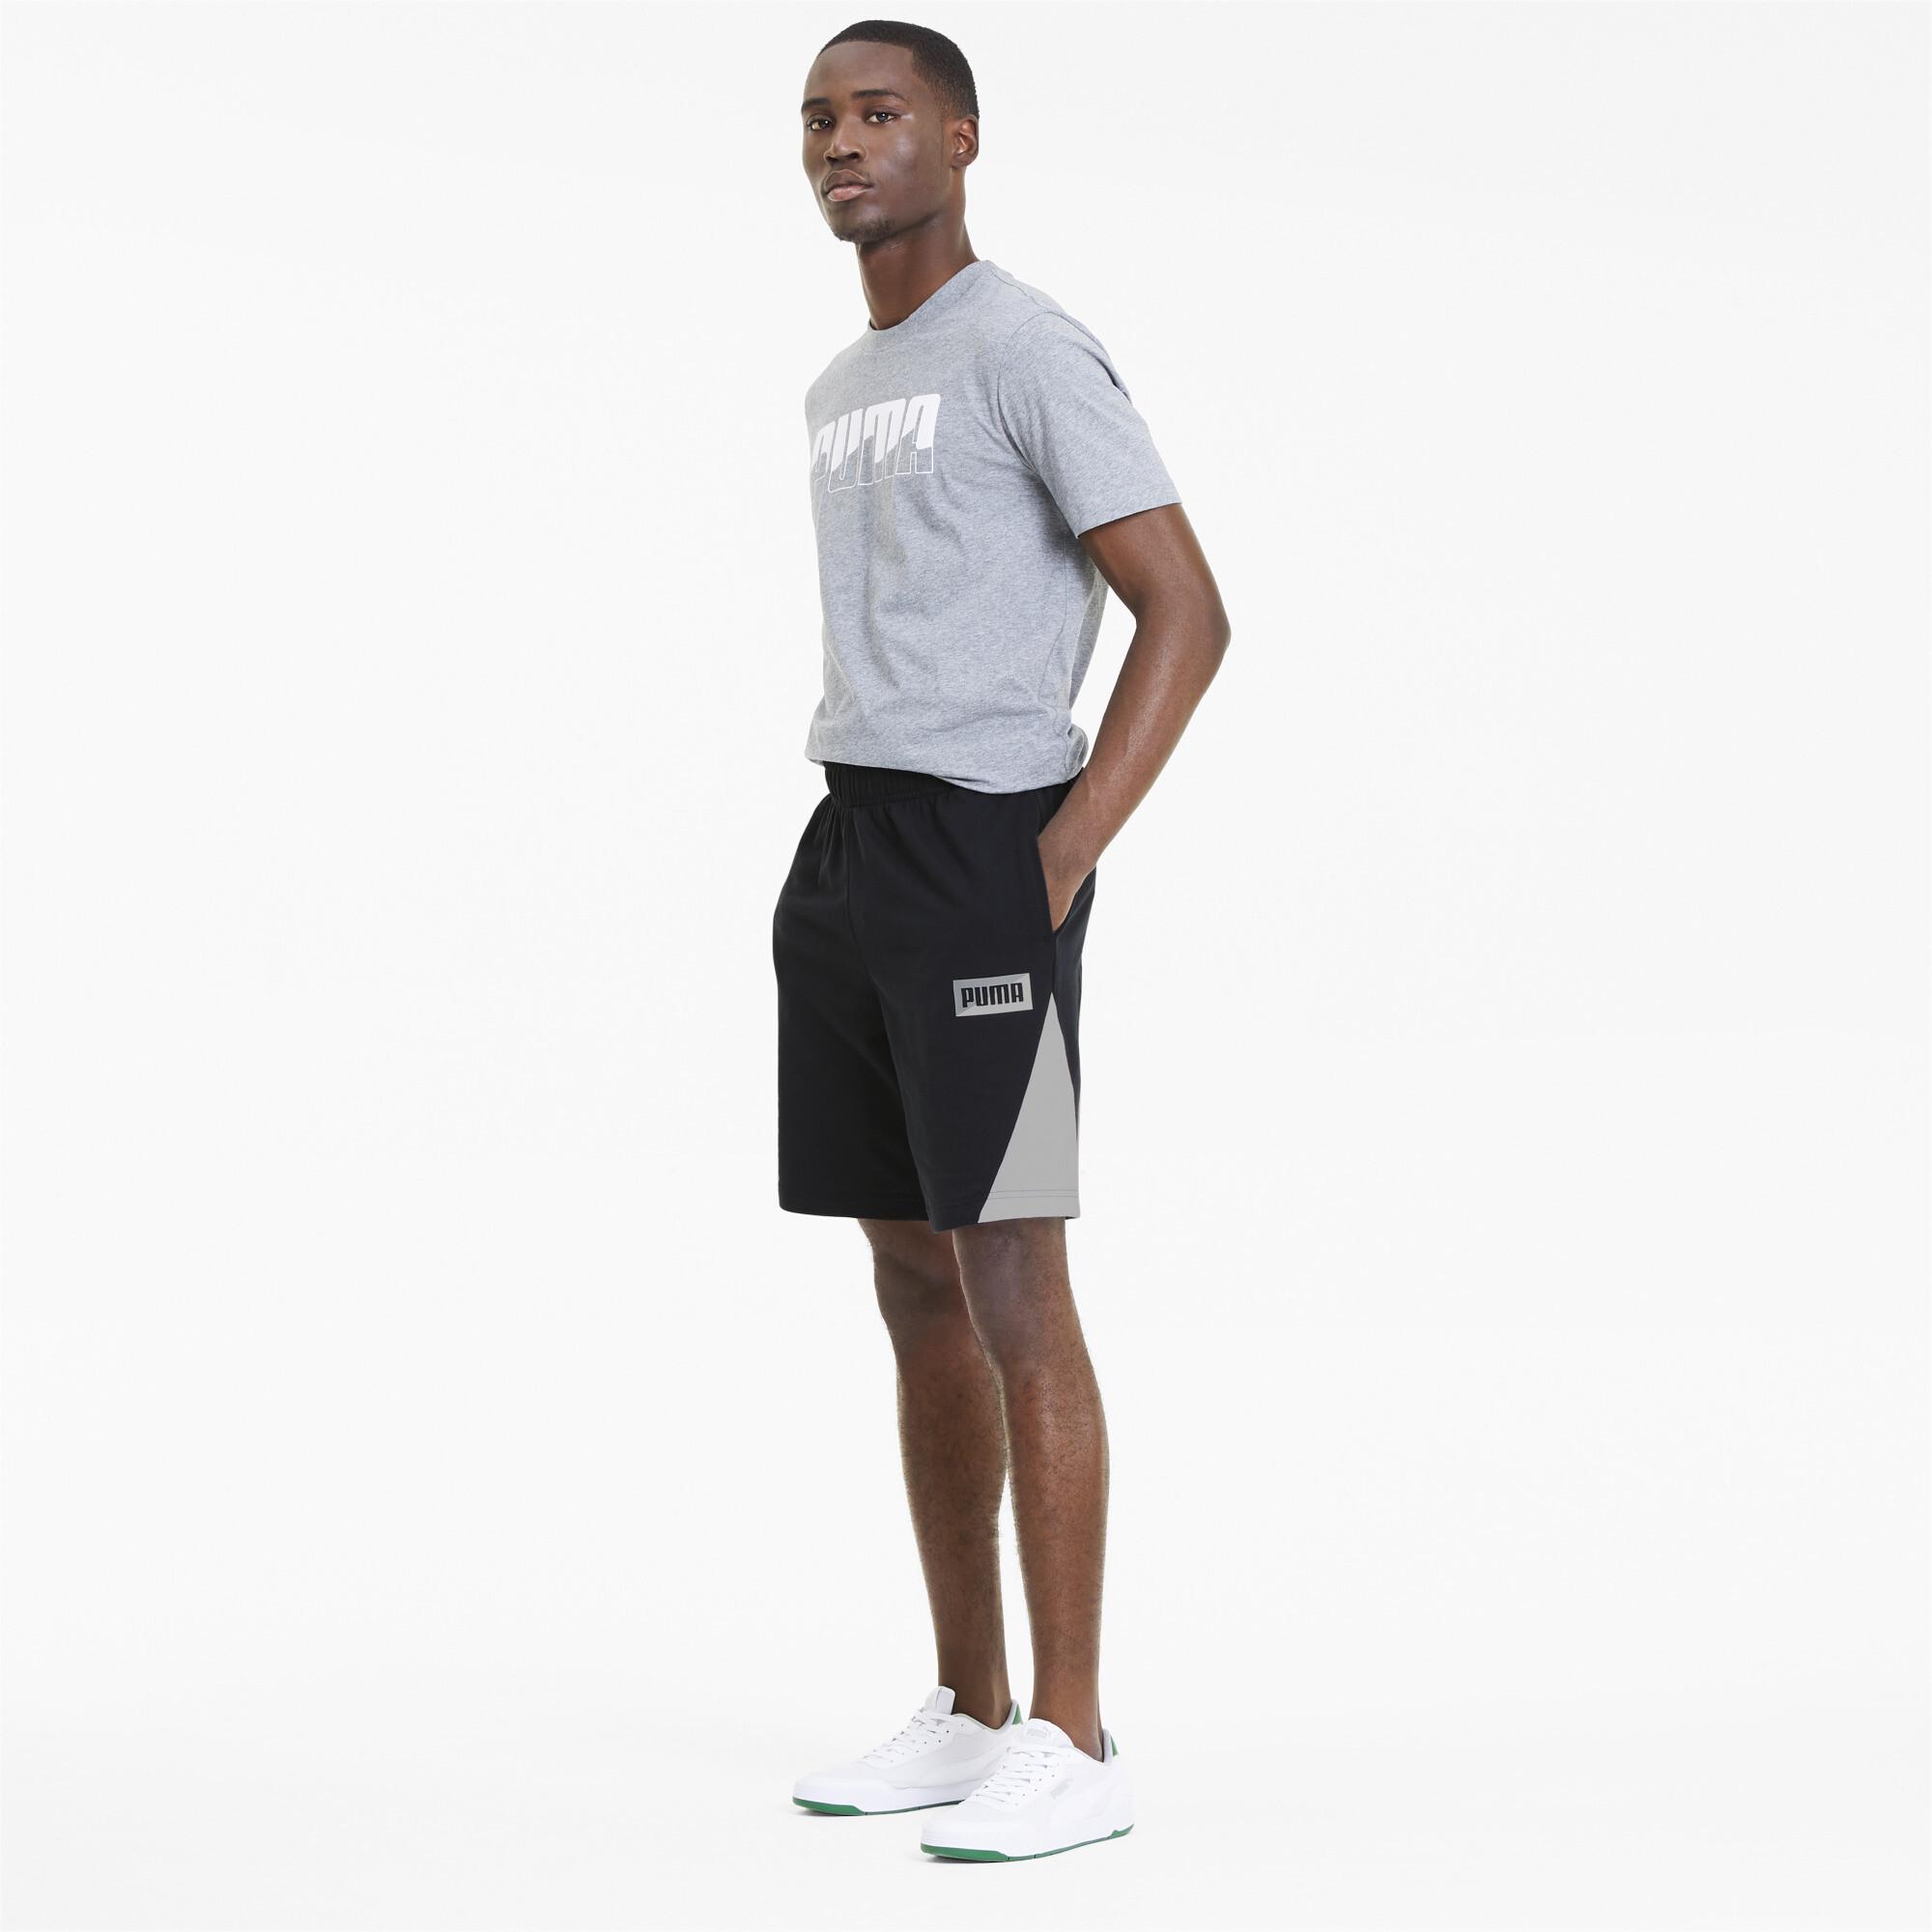 PUMA-Summer-Print-Men-039-s-Shorts-Men-Knitted-Shorts-Basics thumbnail 11